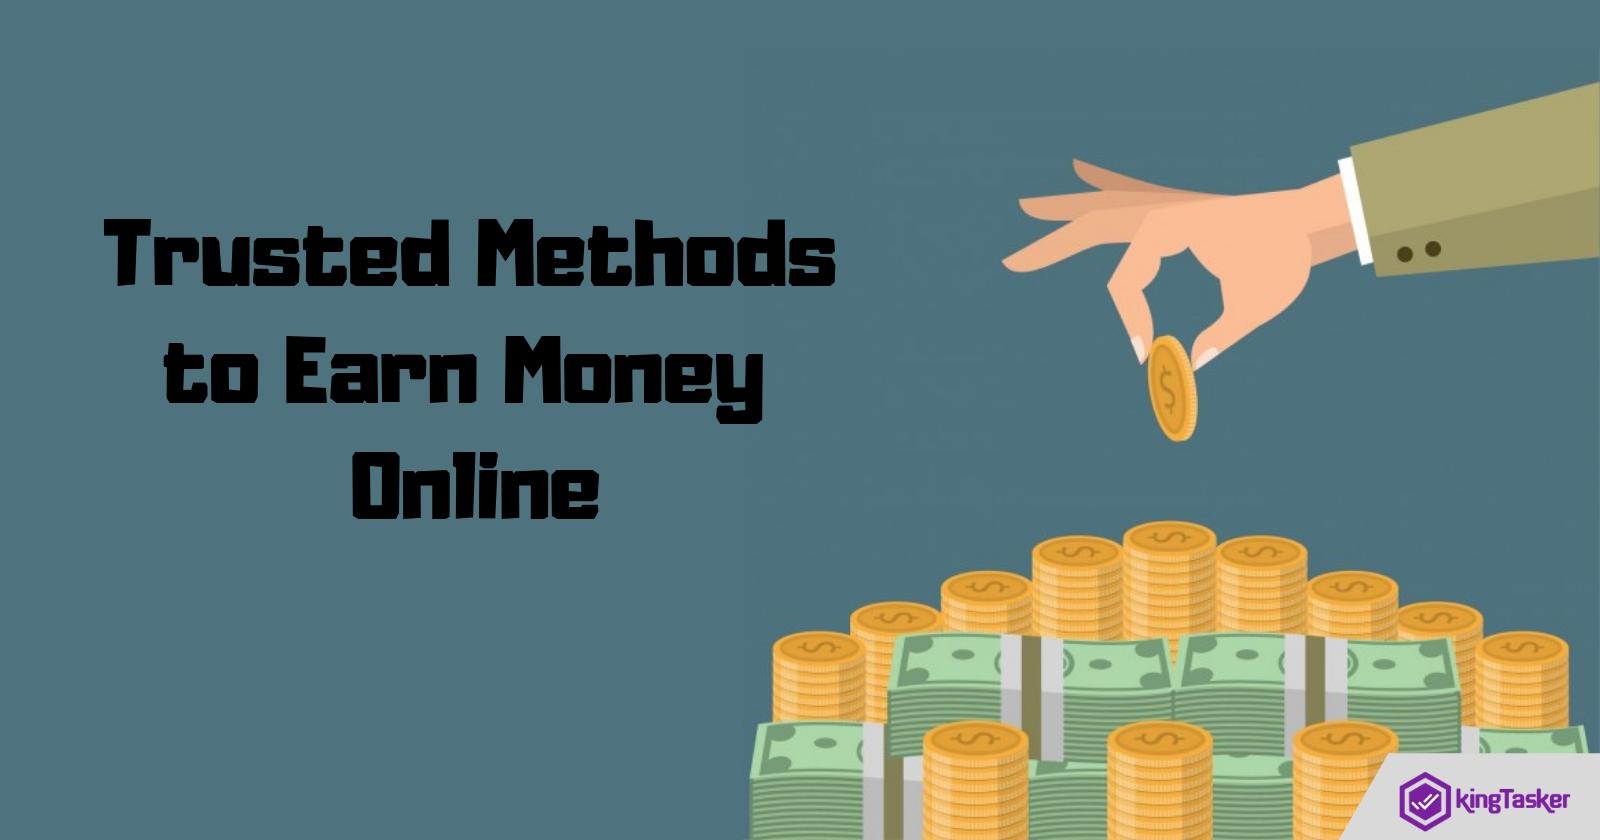 Trusted Methods to Earn Money Online